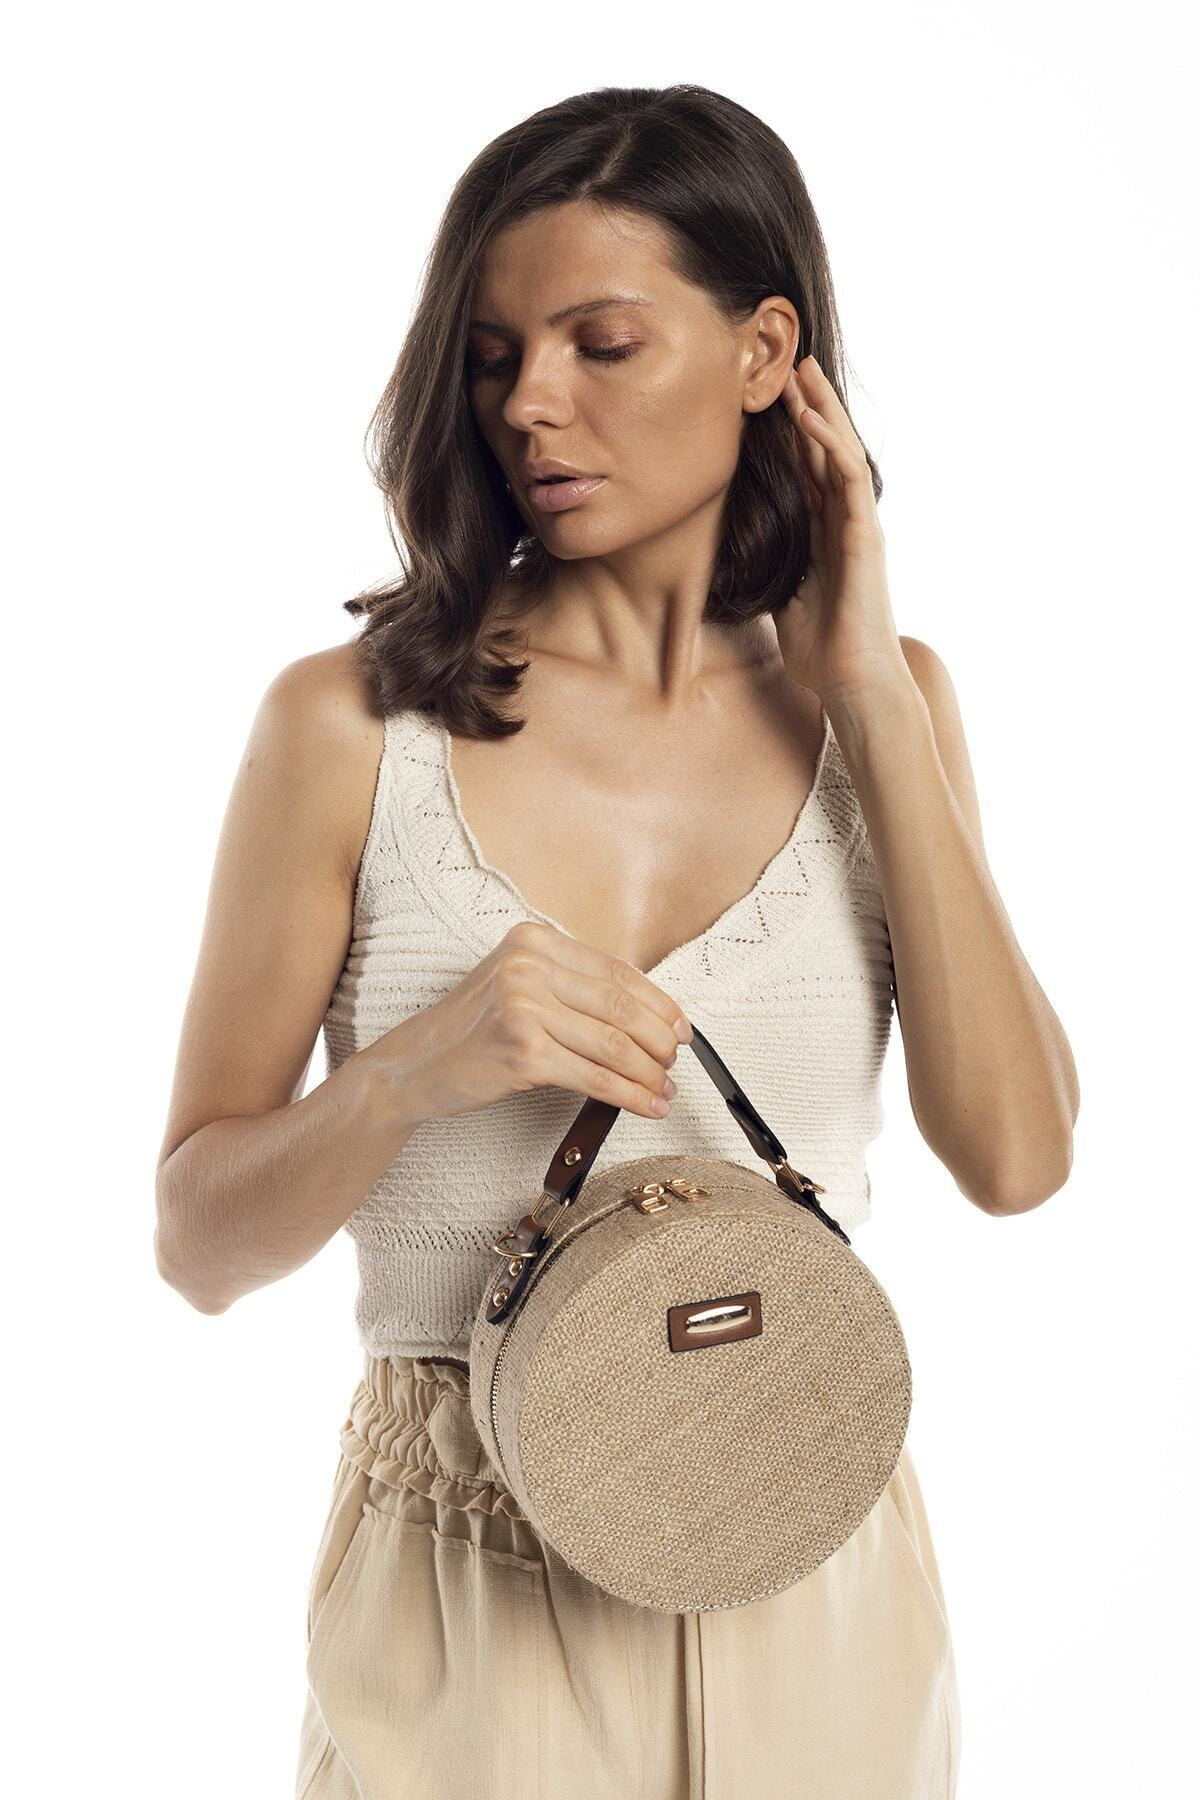 ŞERBETS women shoulder bag 2020 autumn winter dropshipping shein